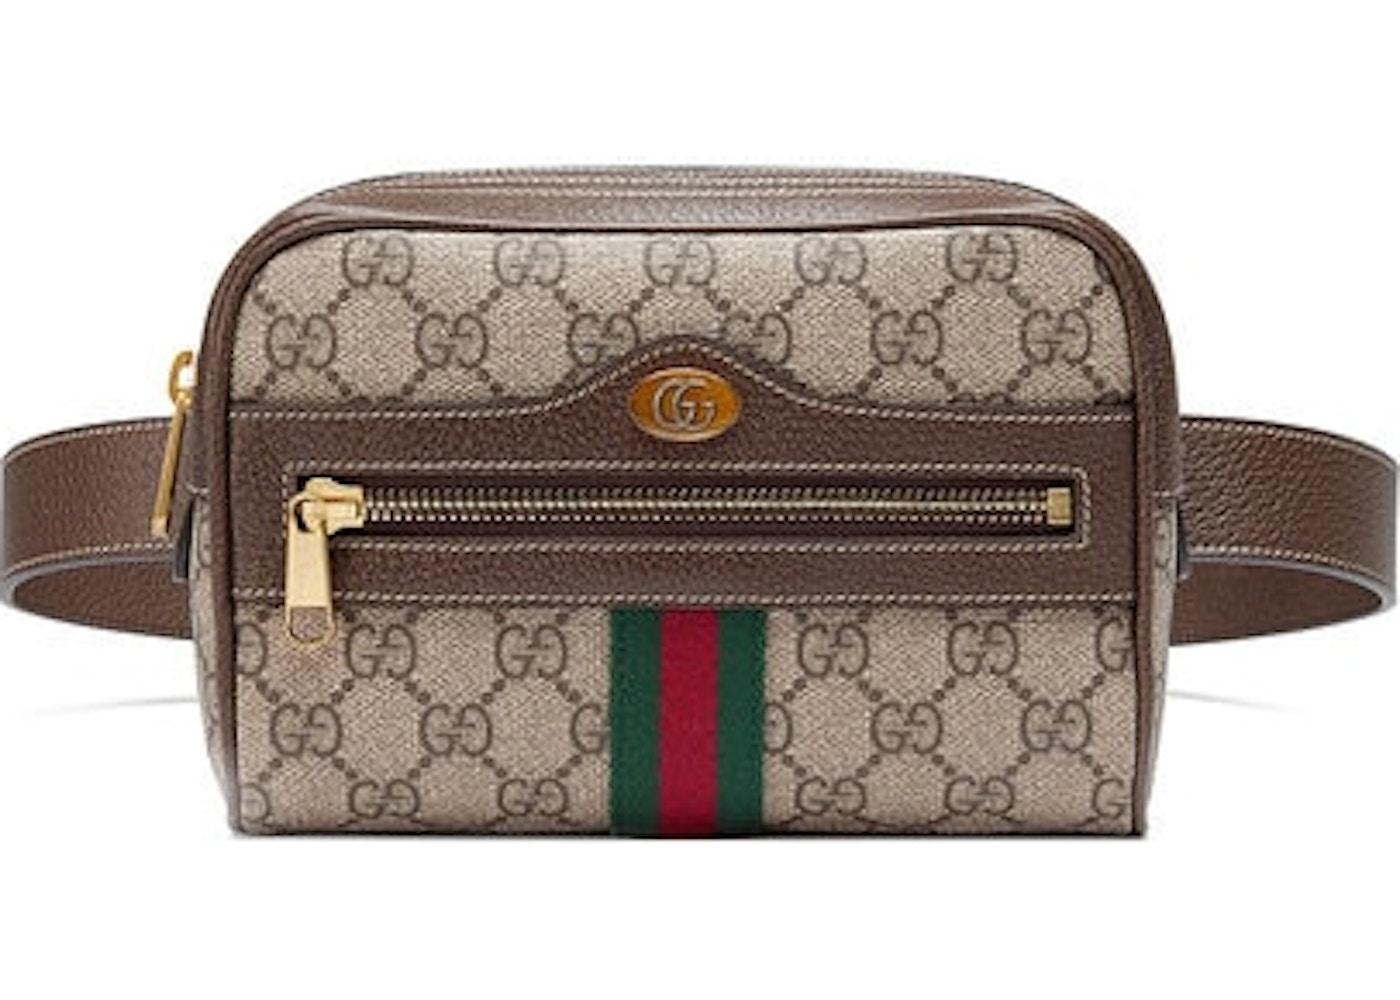 7172a6adda452e Gucci Ophidia Belt Bag GG Supreme Small Beige/Ebony